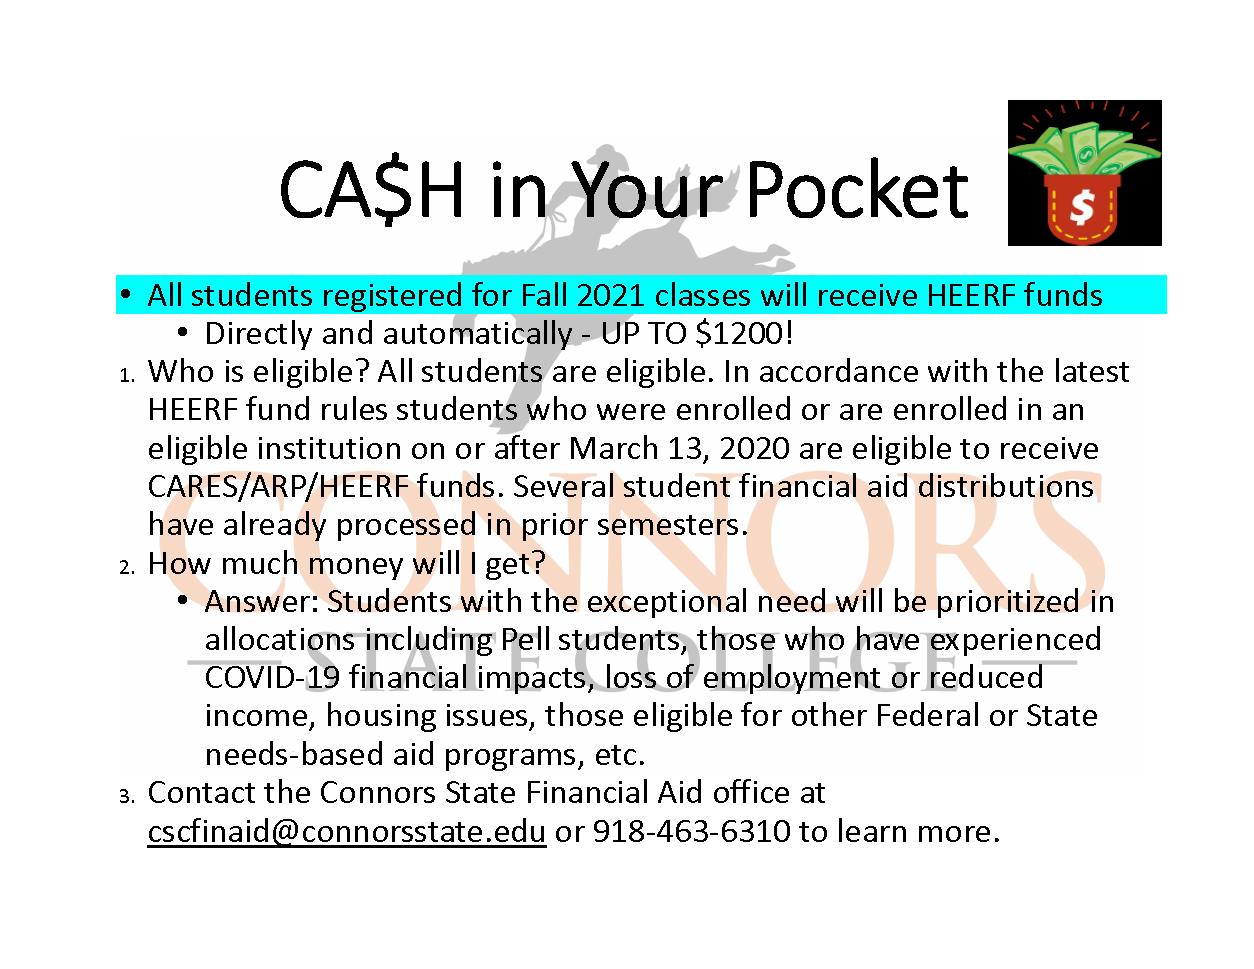 Cash in Your Pocket